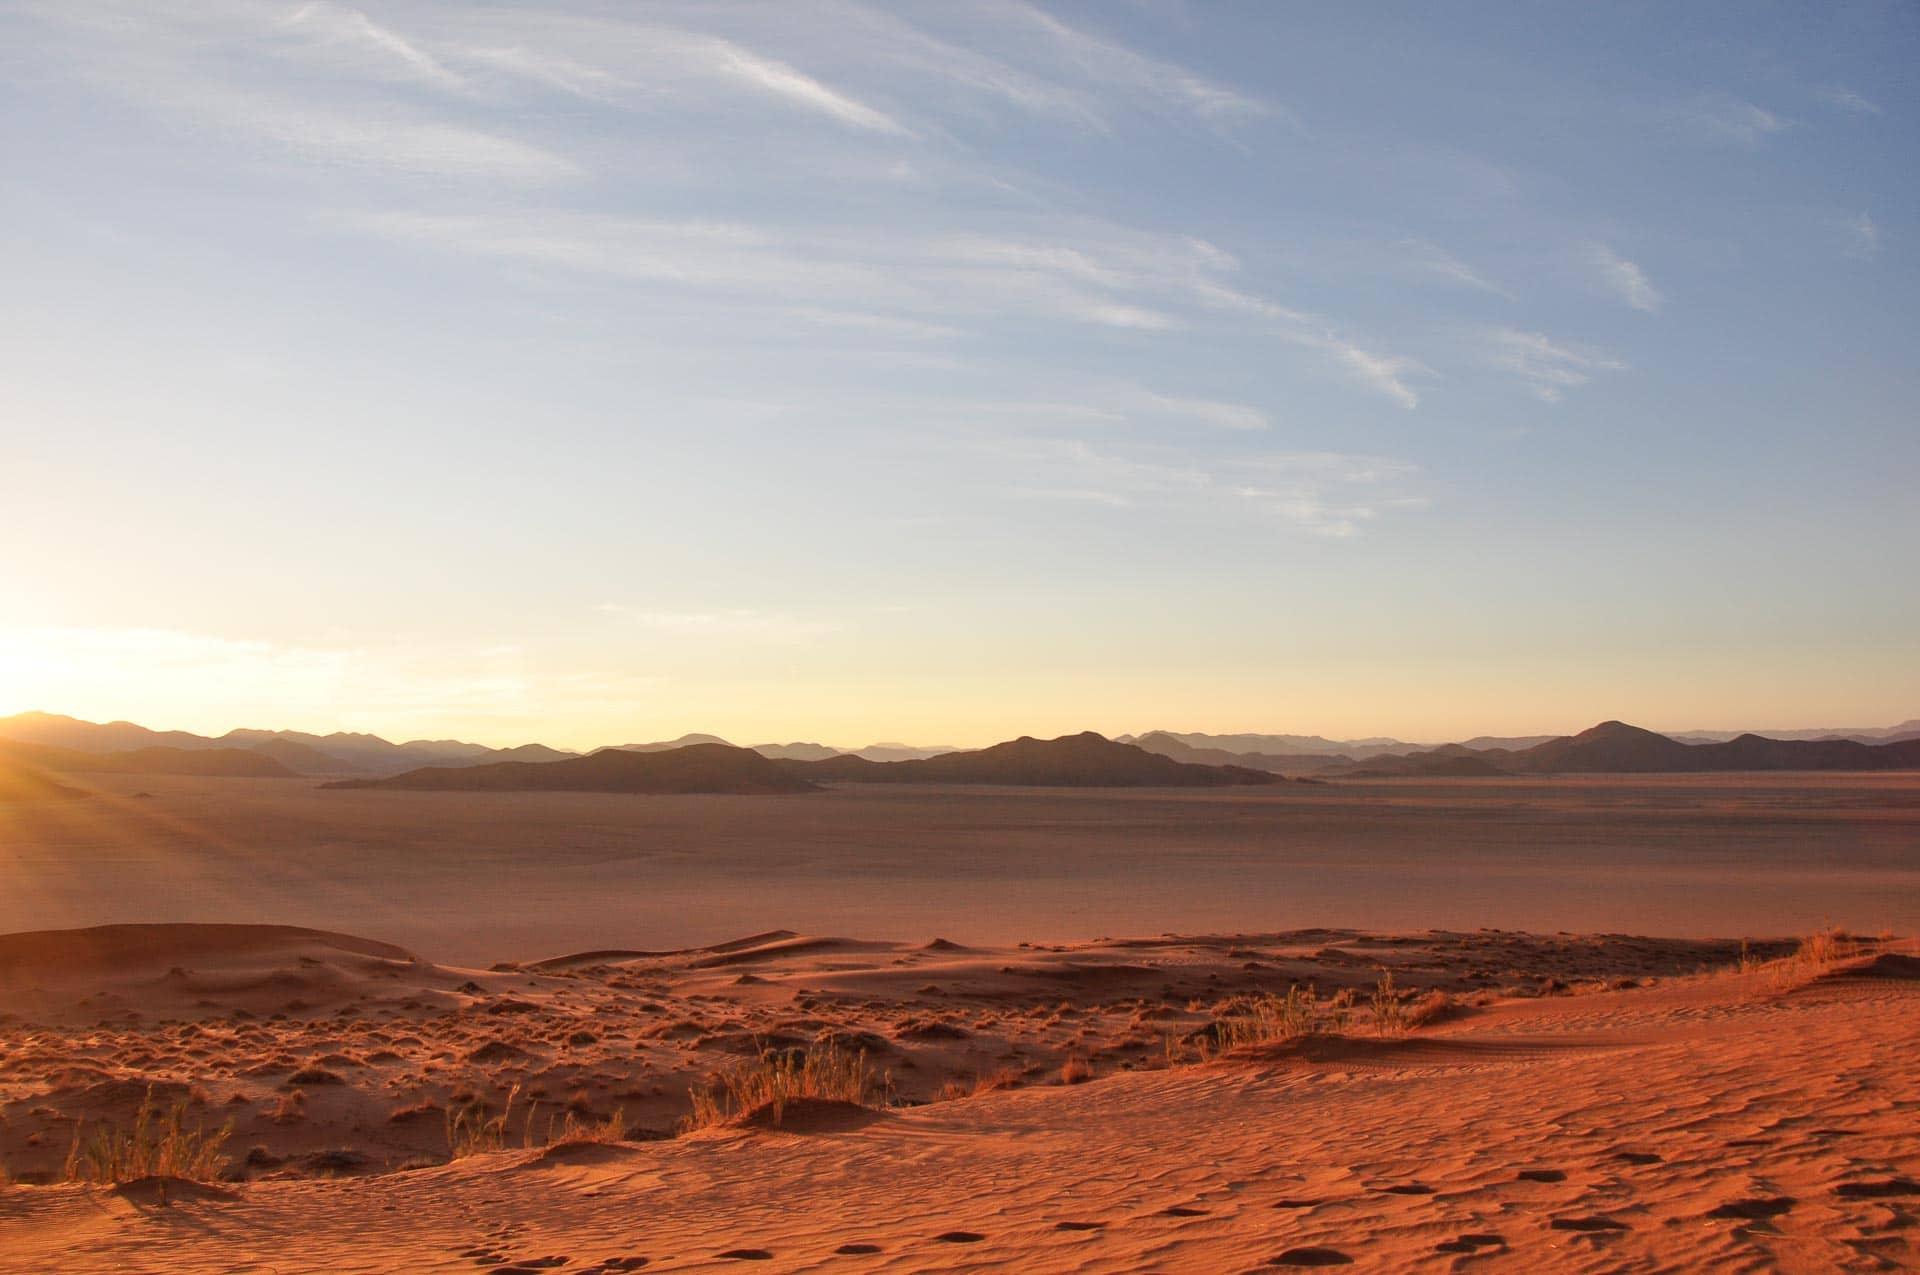 Kanaan-Desert-Retreat-Namibia-Globetrotter-Select-28